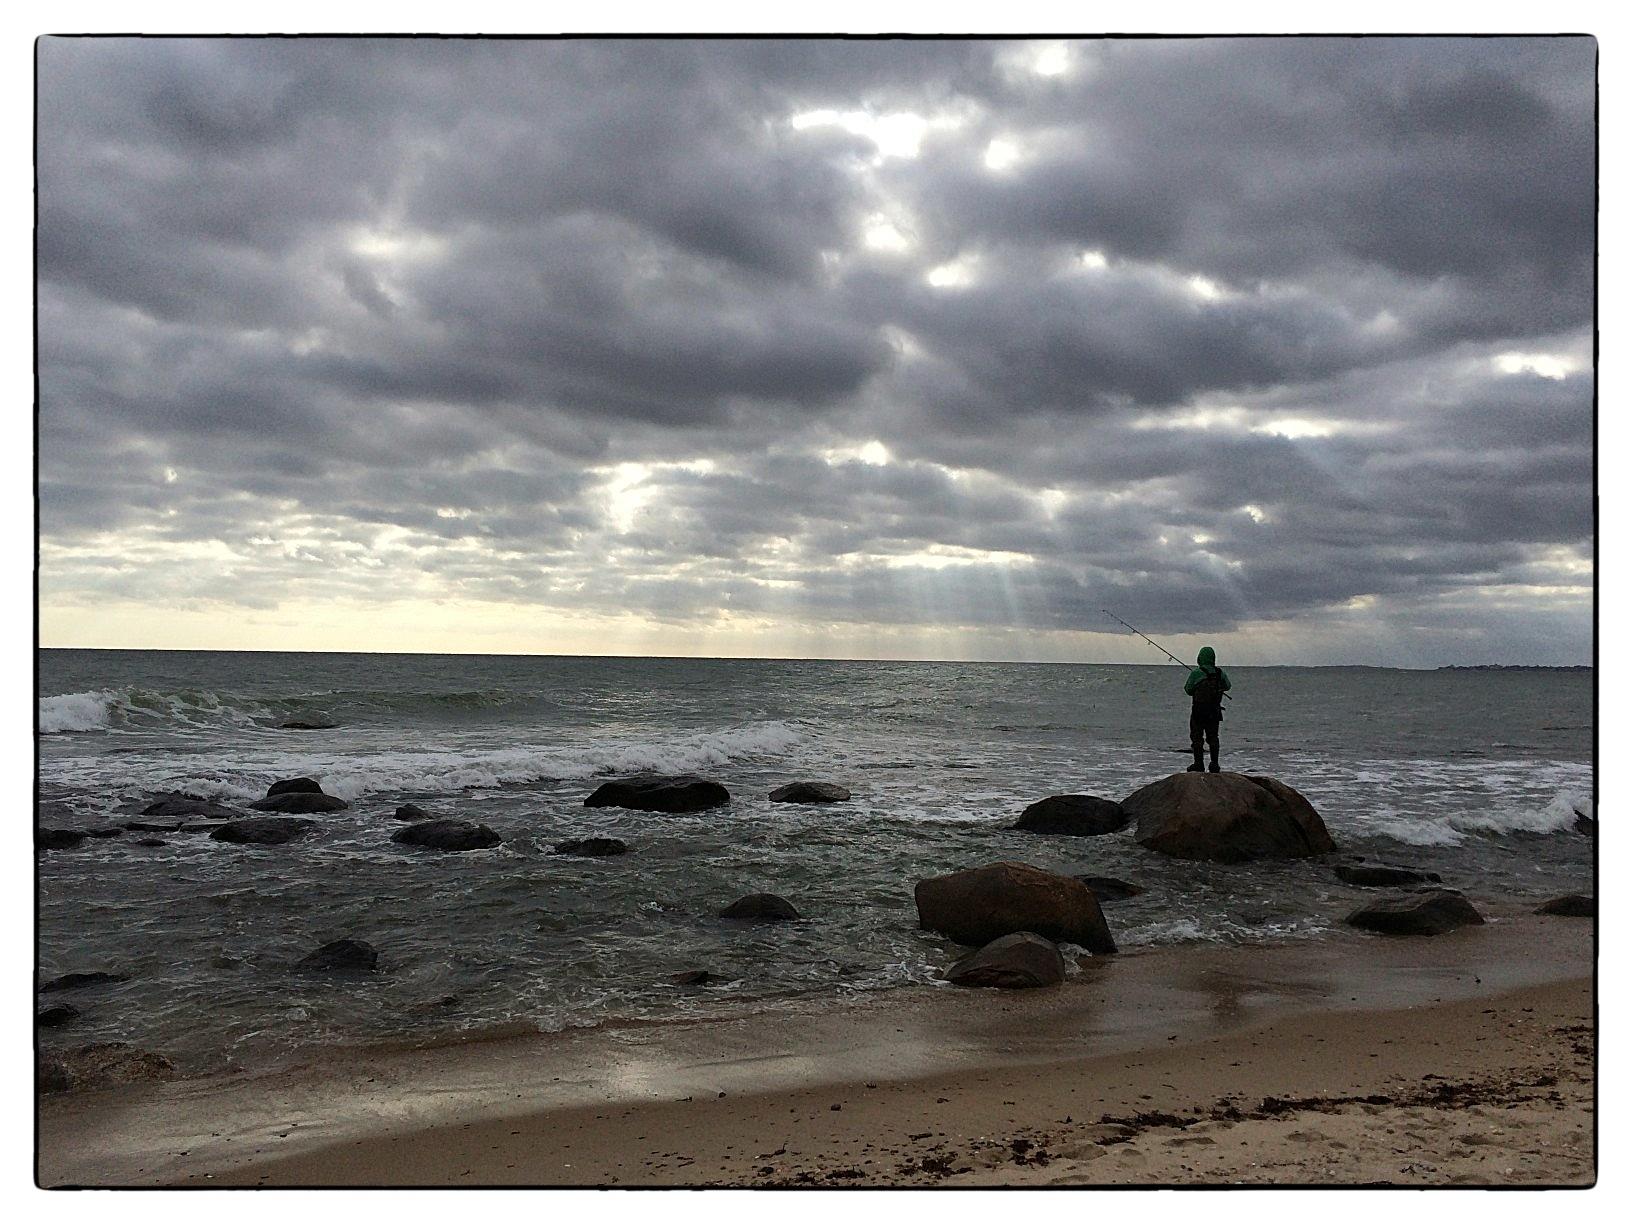 Weekapaug rocks, looking toward Misquamicut Beach, in Westerly, R.I., shot October 12, 2013.